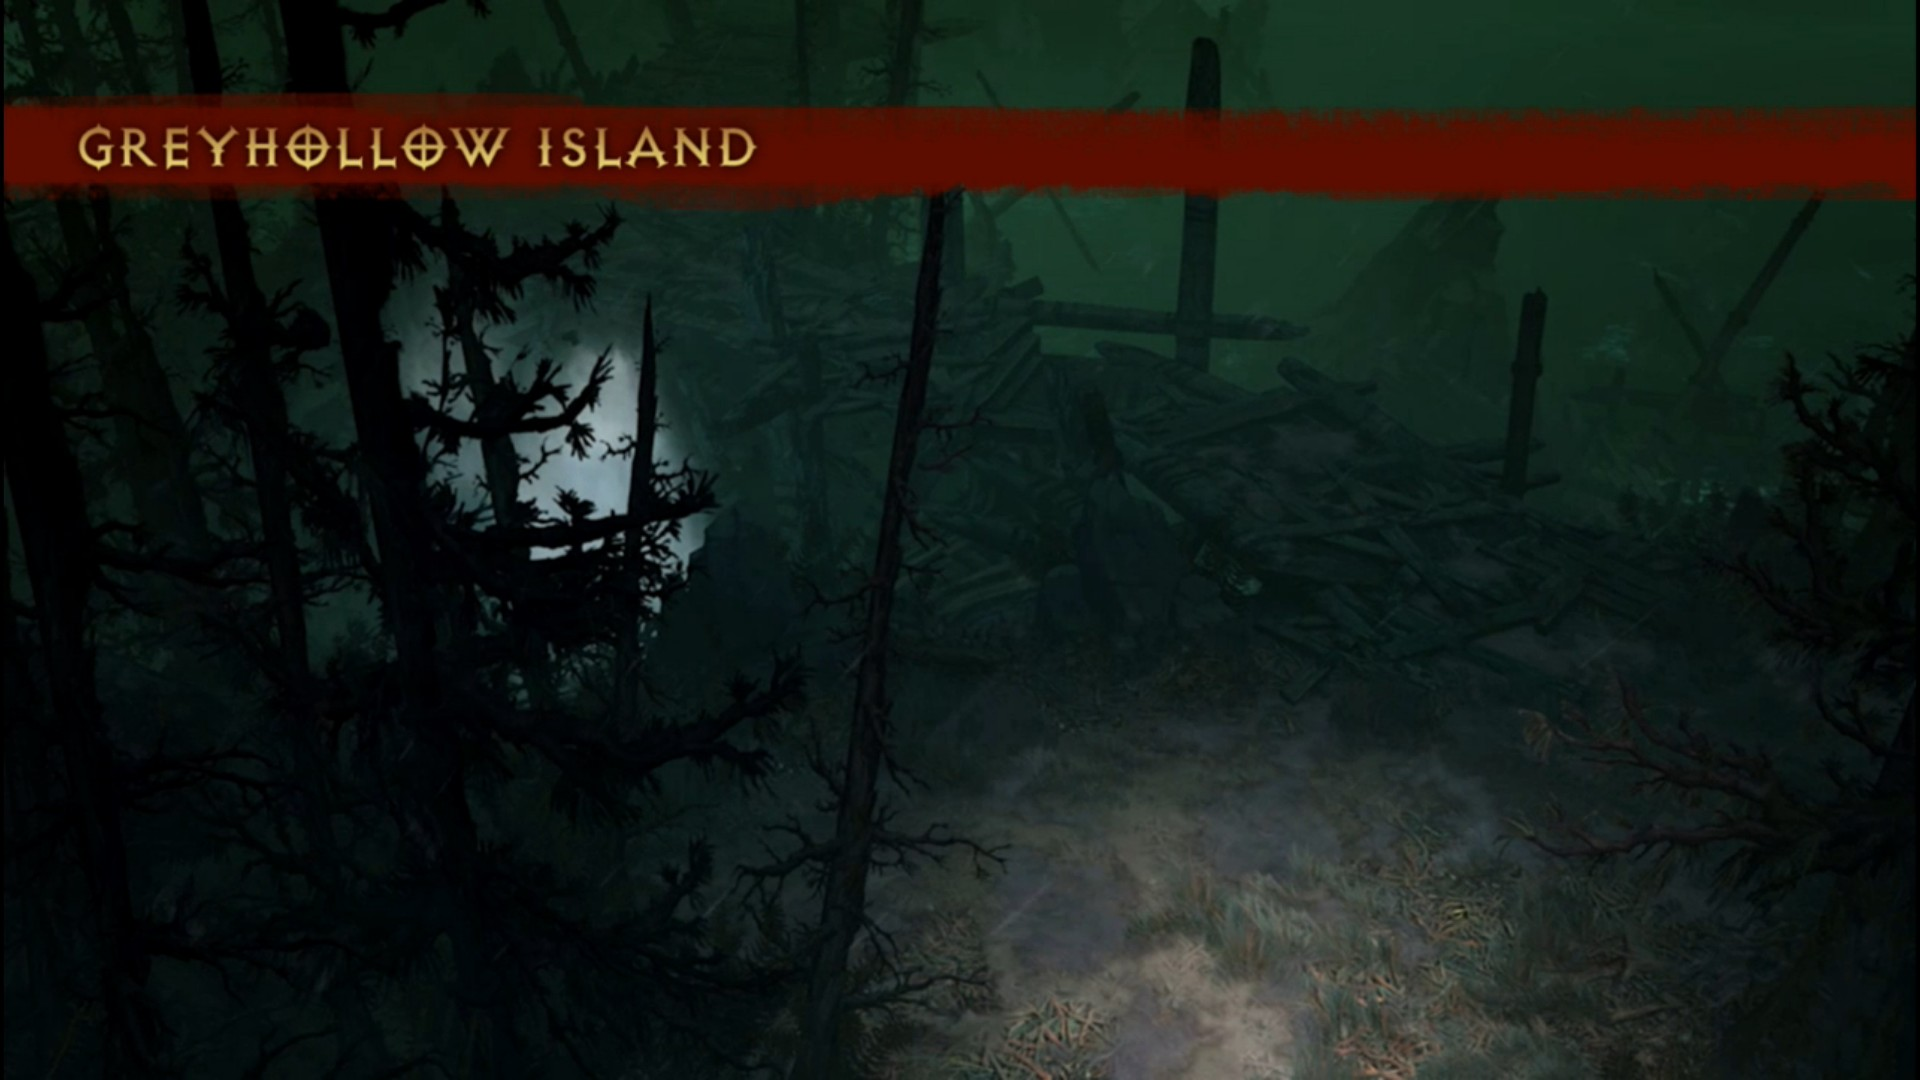 greyhollow-island-preview.jpg